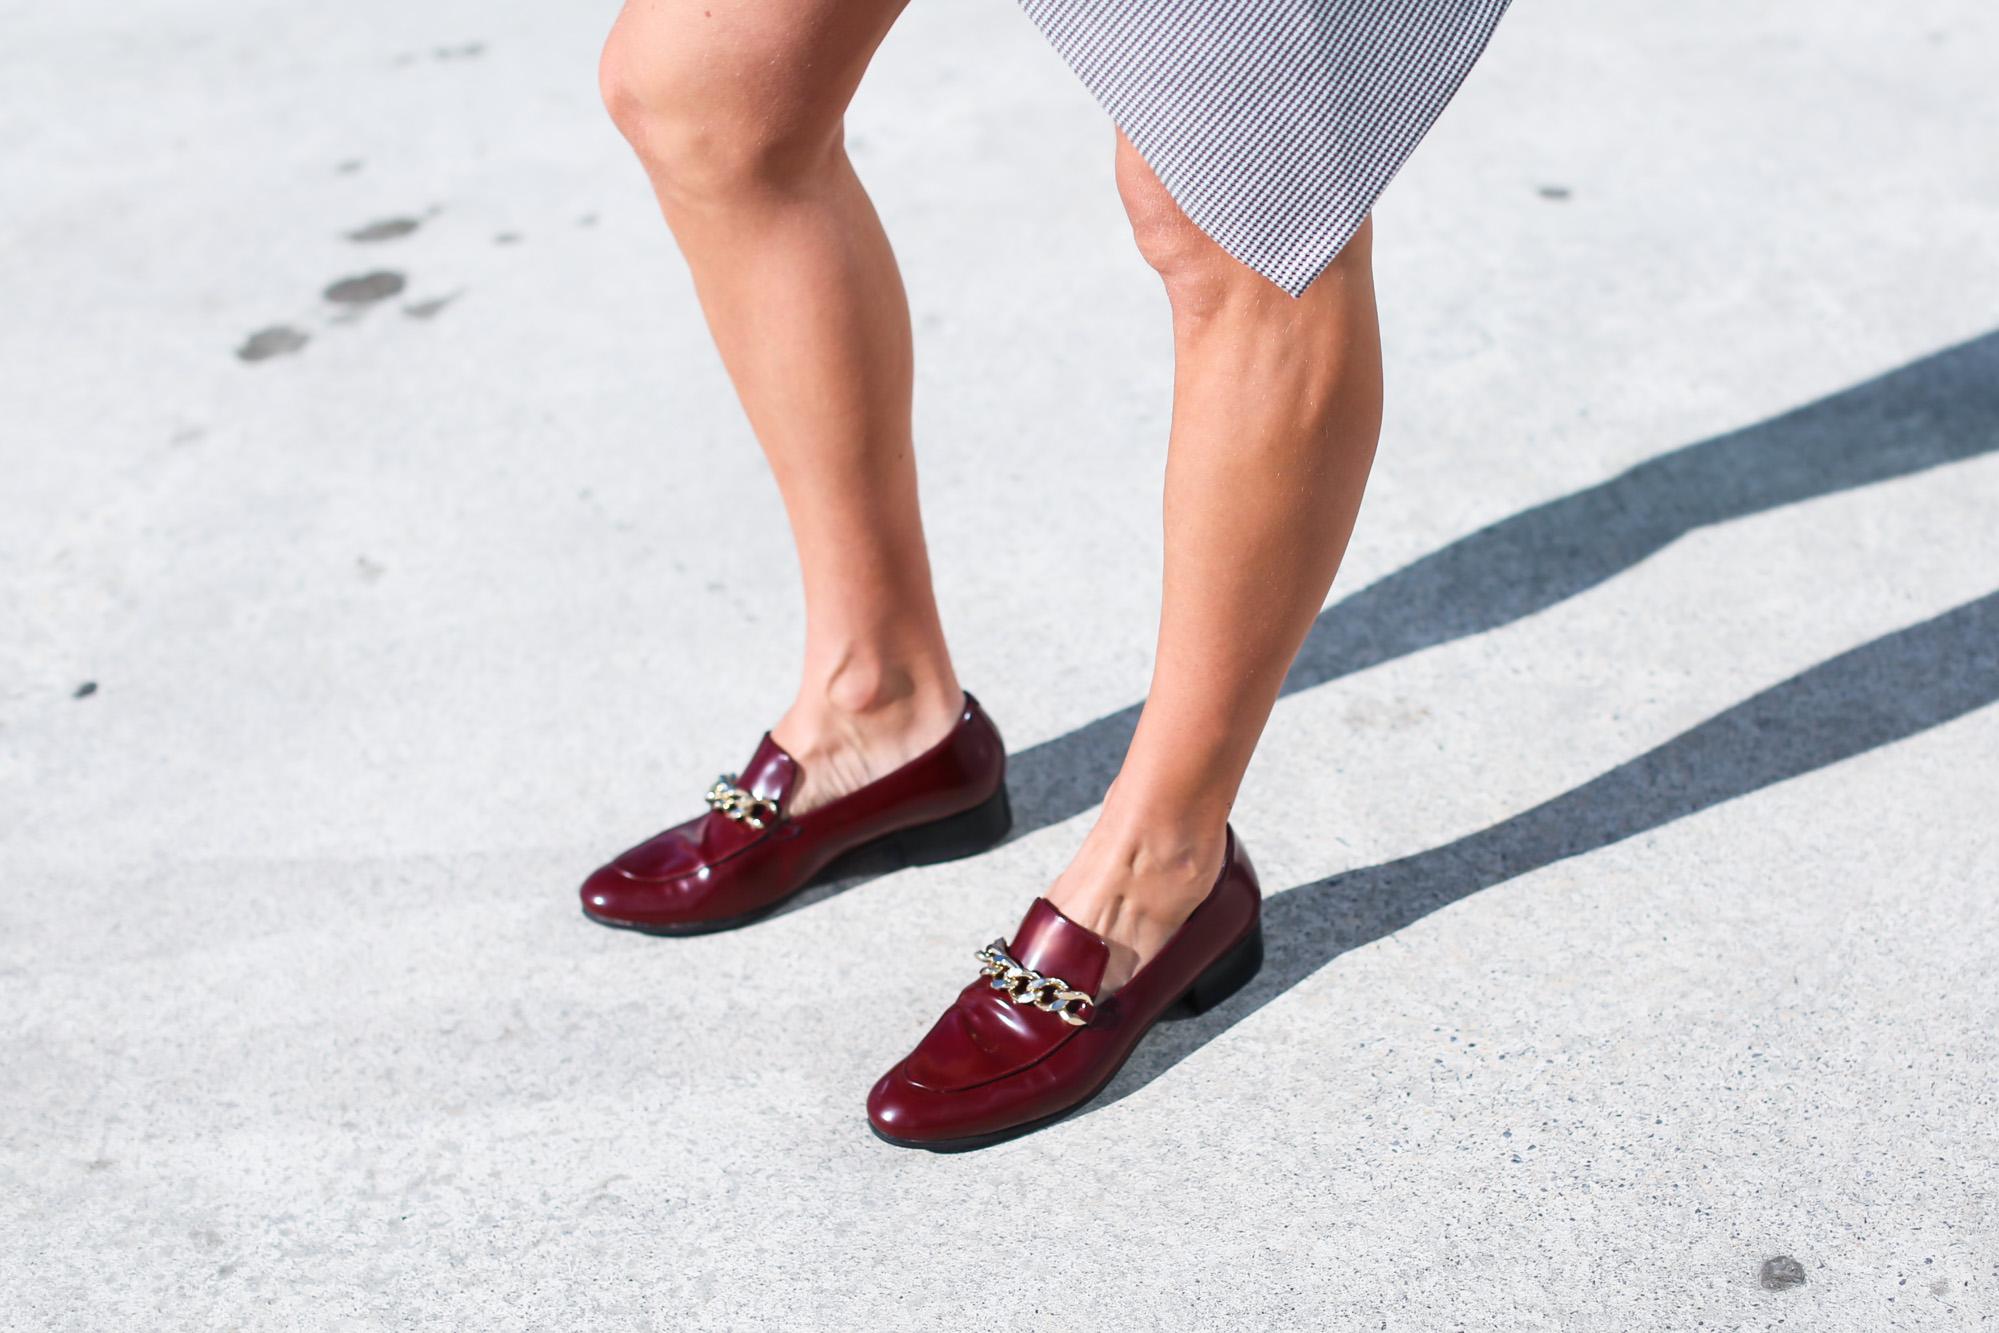 clochet_streetstyle_fashionblogger_leatherloafers_zara_asymmetric_toothgooseminiskirt-8